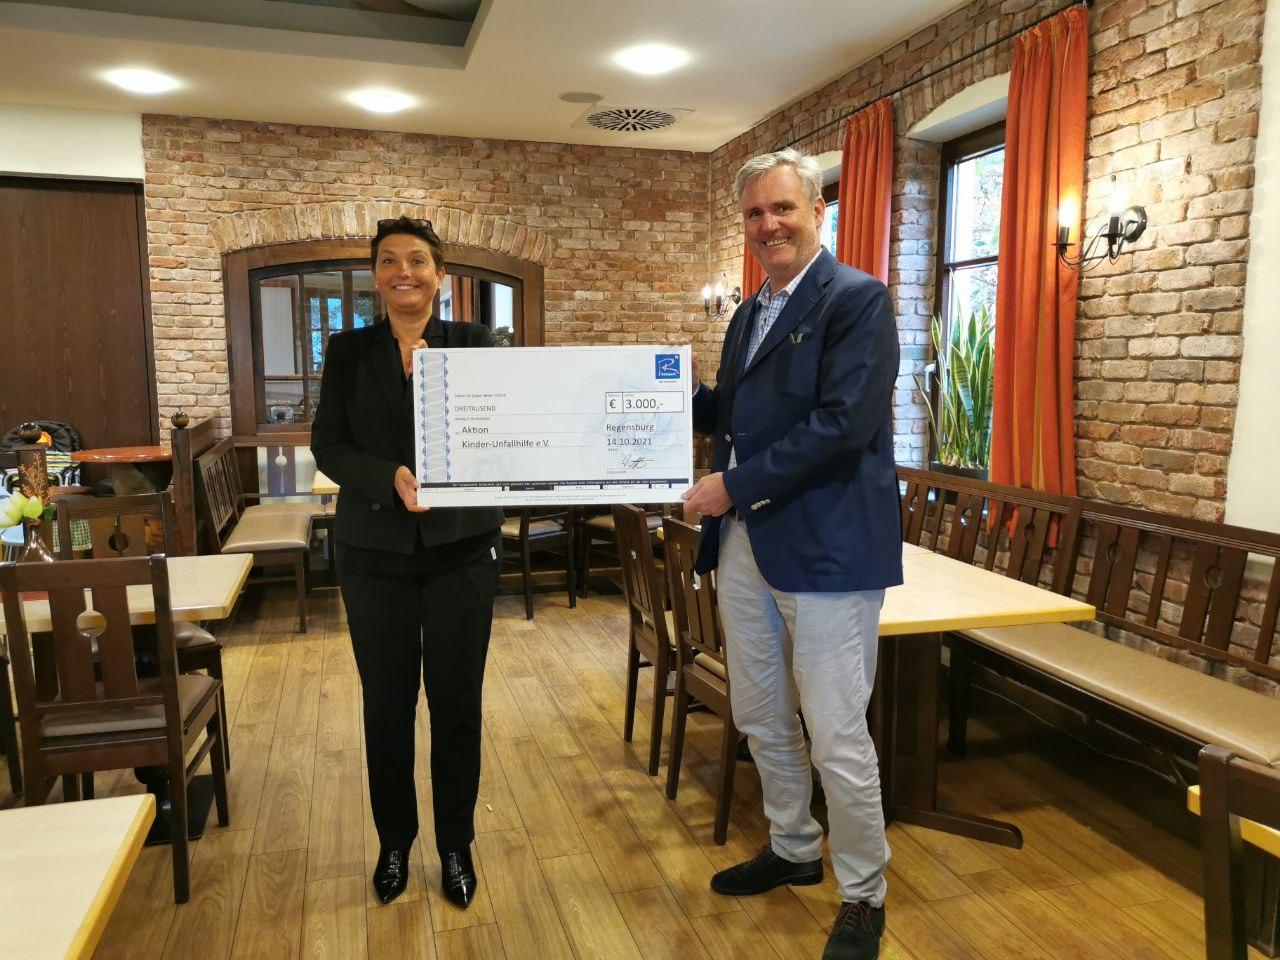 Spenden Kinderunfallhilfe Okober 2021 Regensburg-Ost